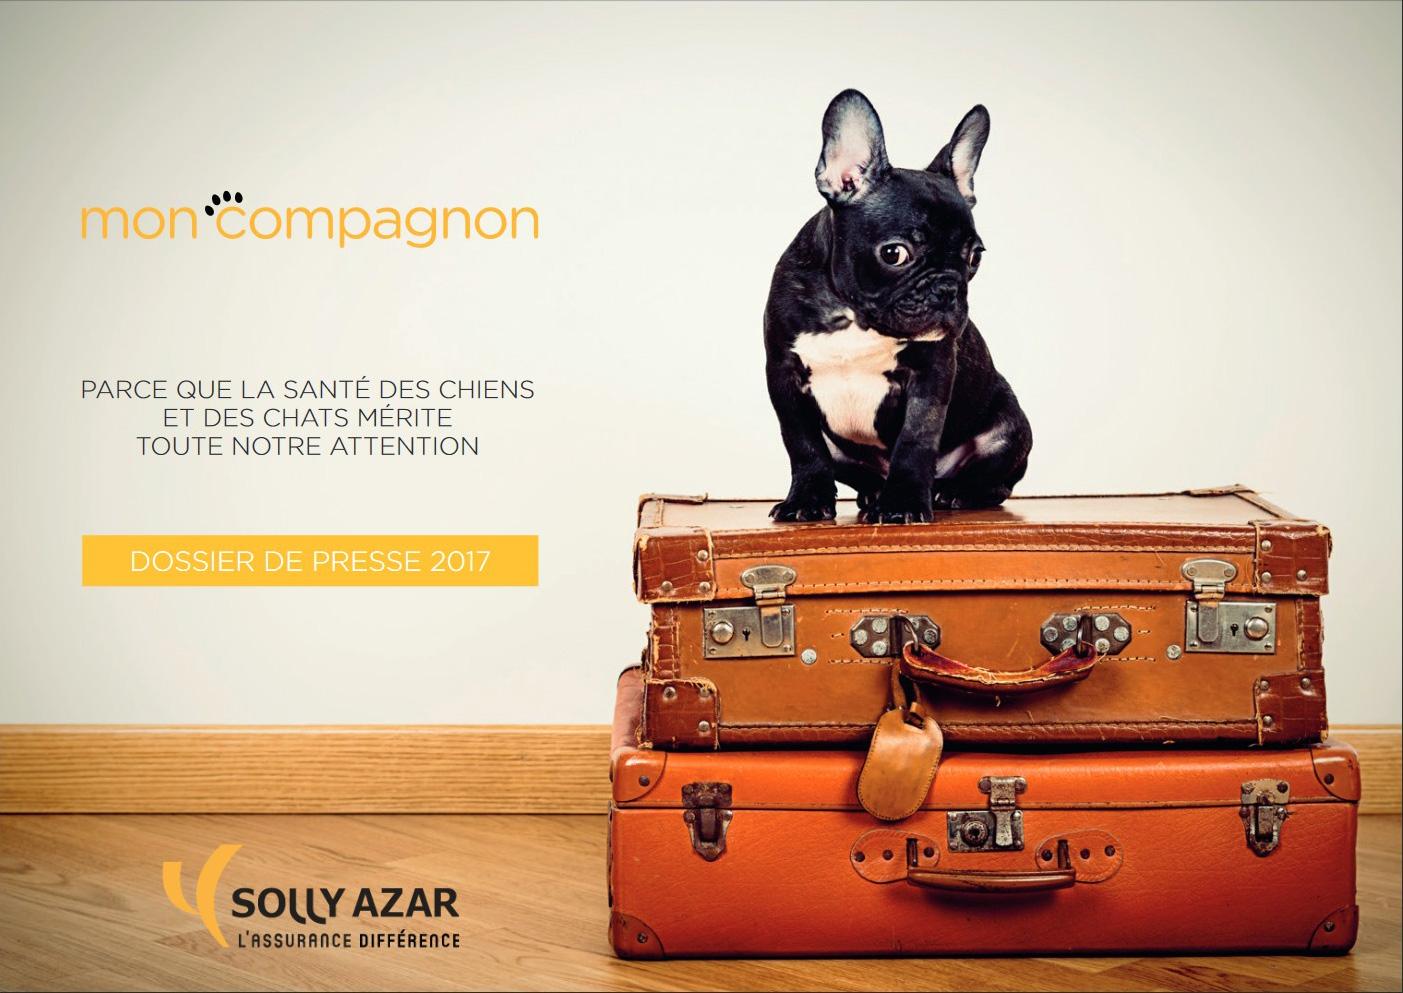 solly azar lance sa premi re application d di e aux propri taires de chiens et de chats solly. Black Bedroom Furniture Sets. Home Design Ideas